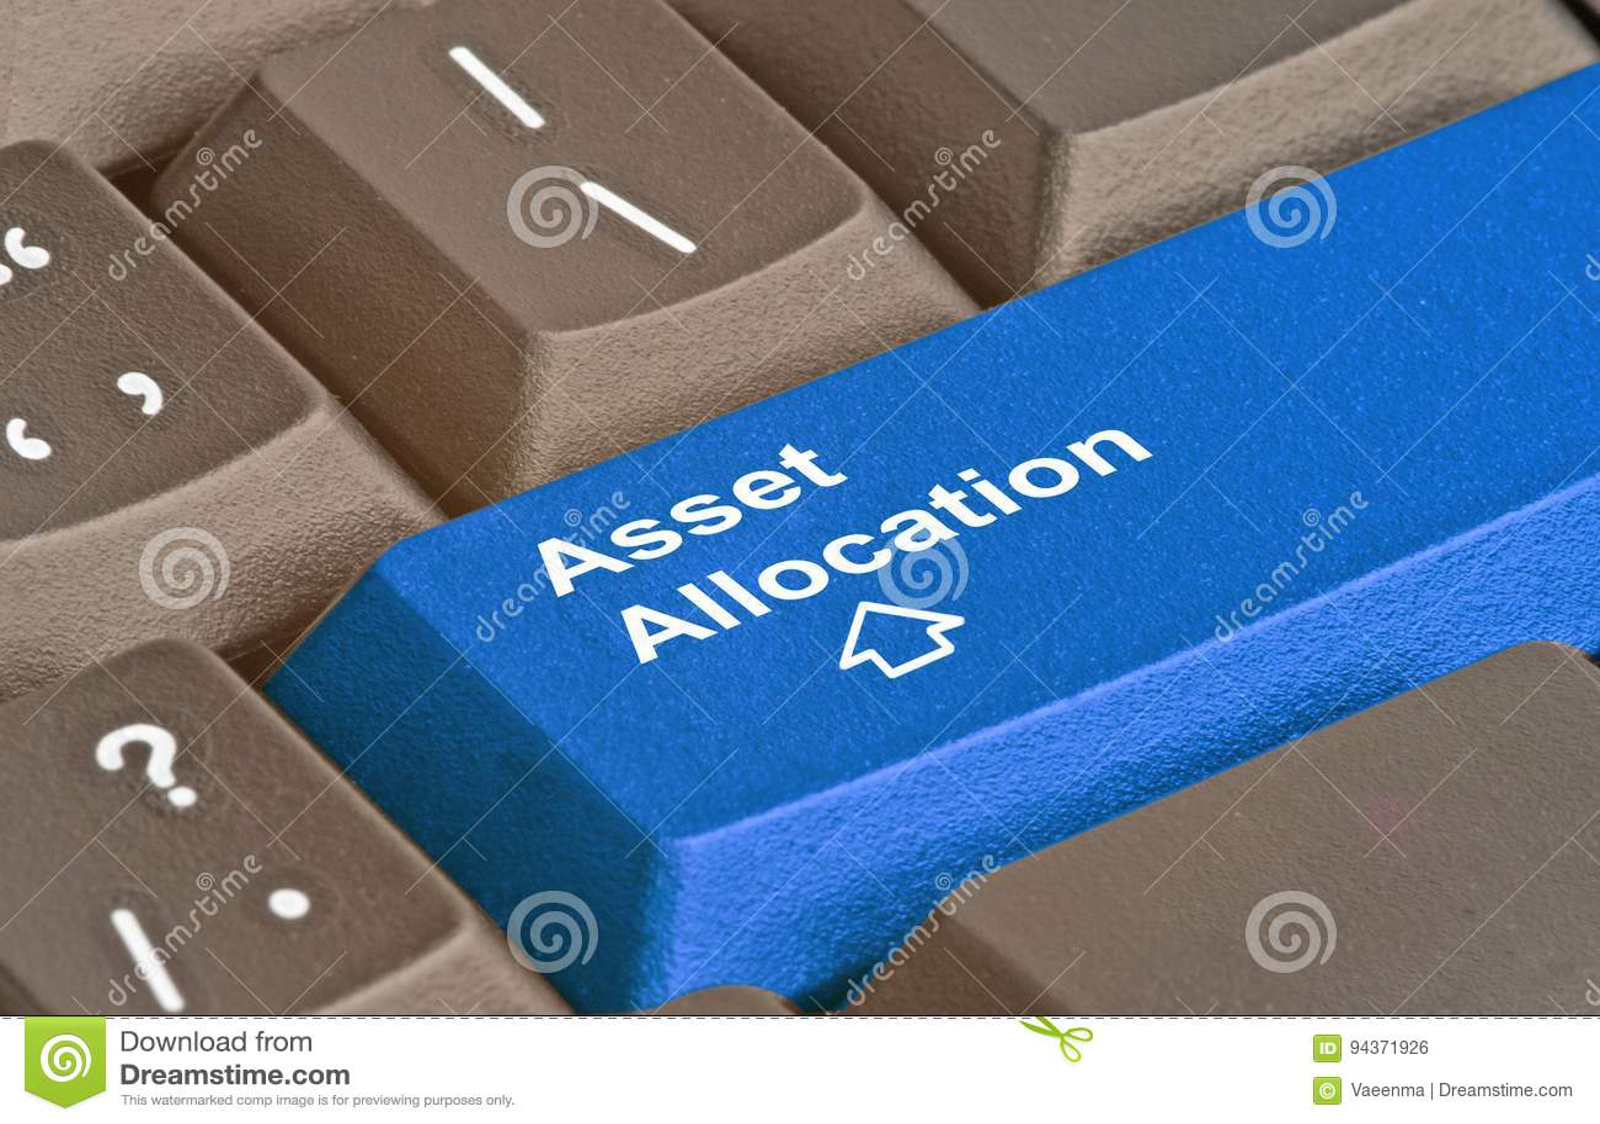 Key for asset allocation